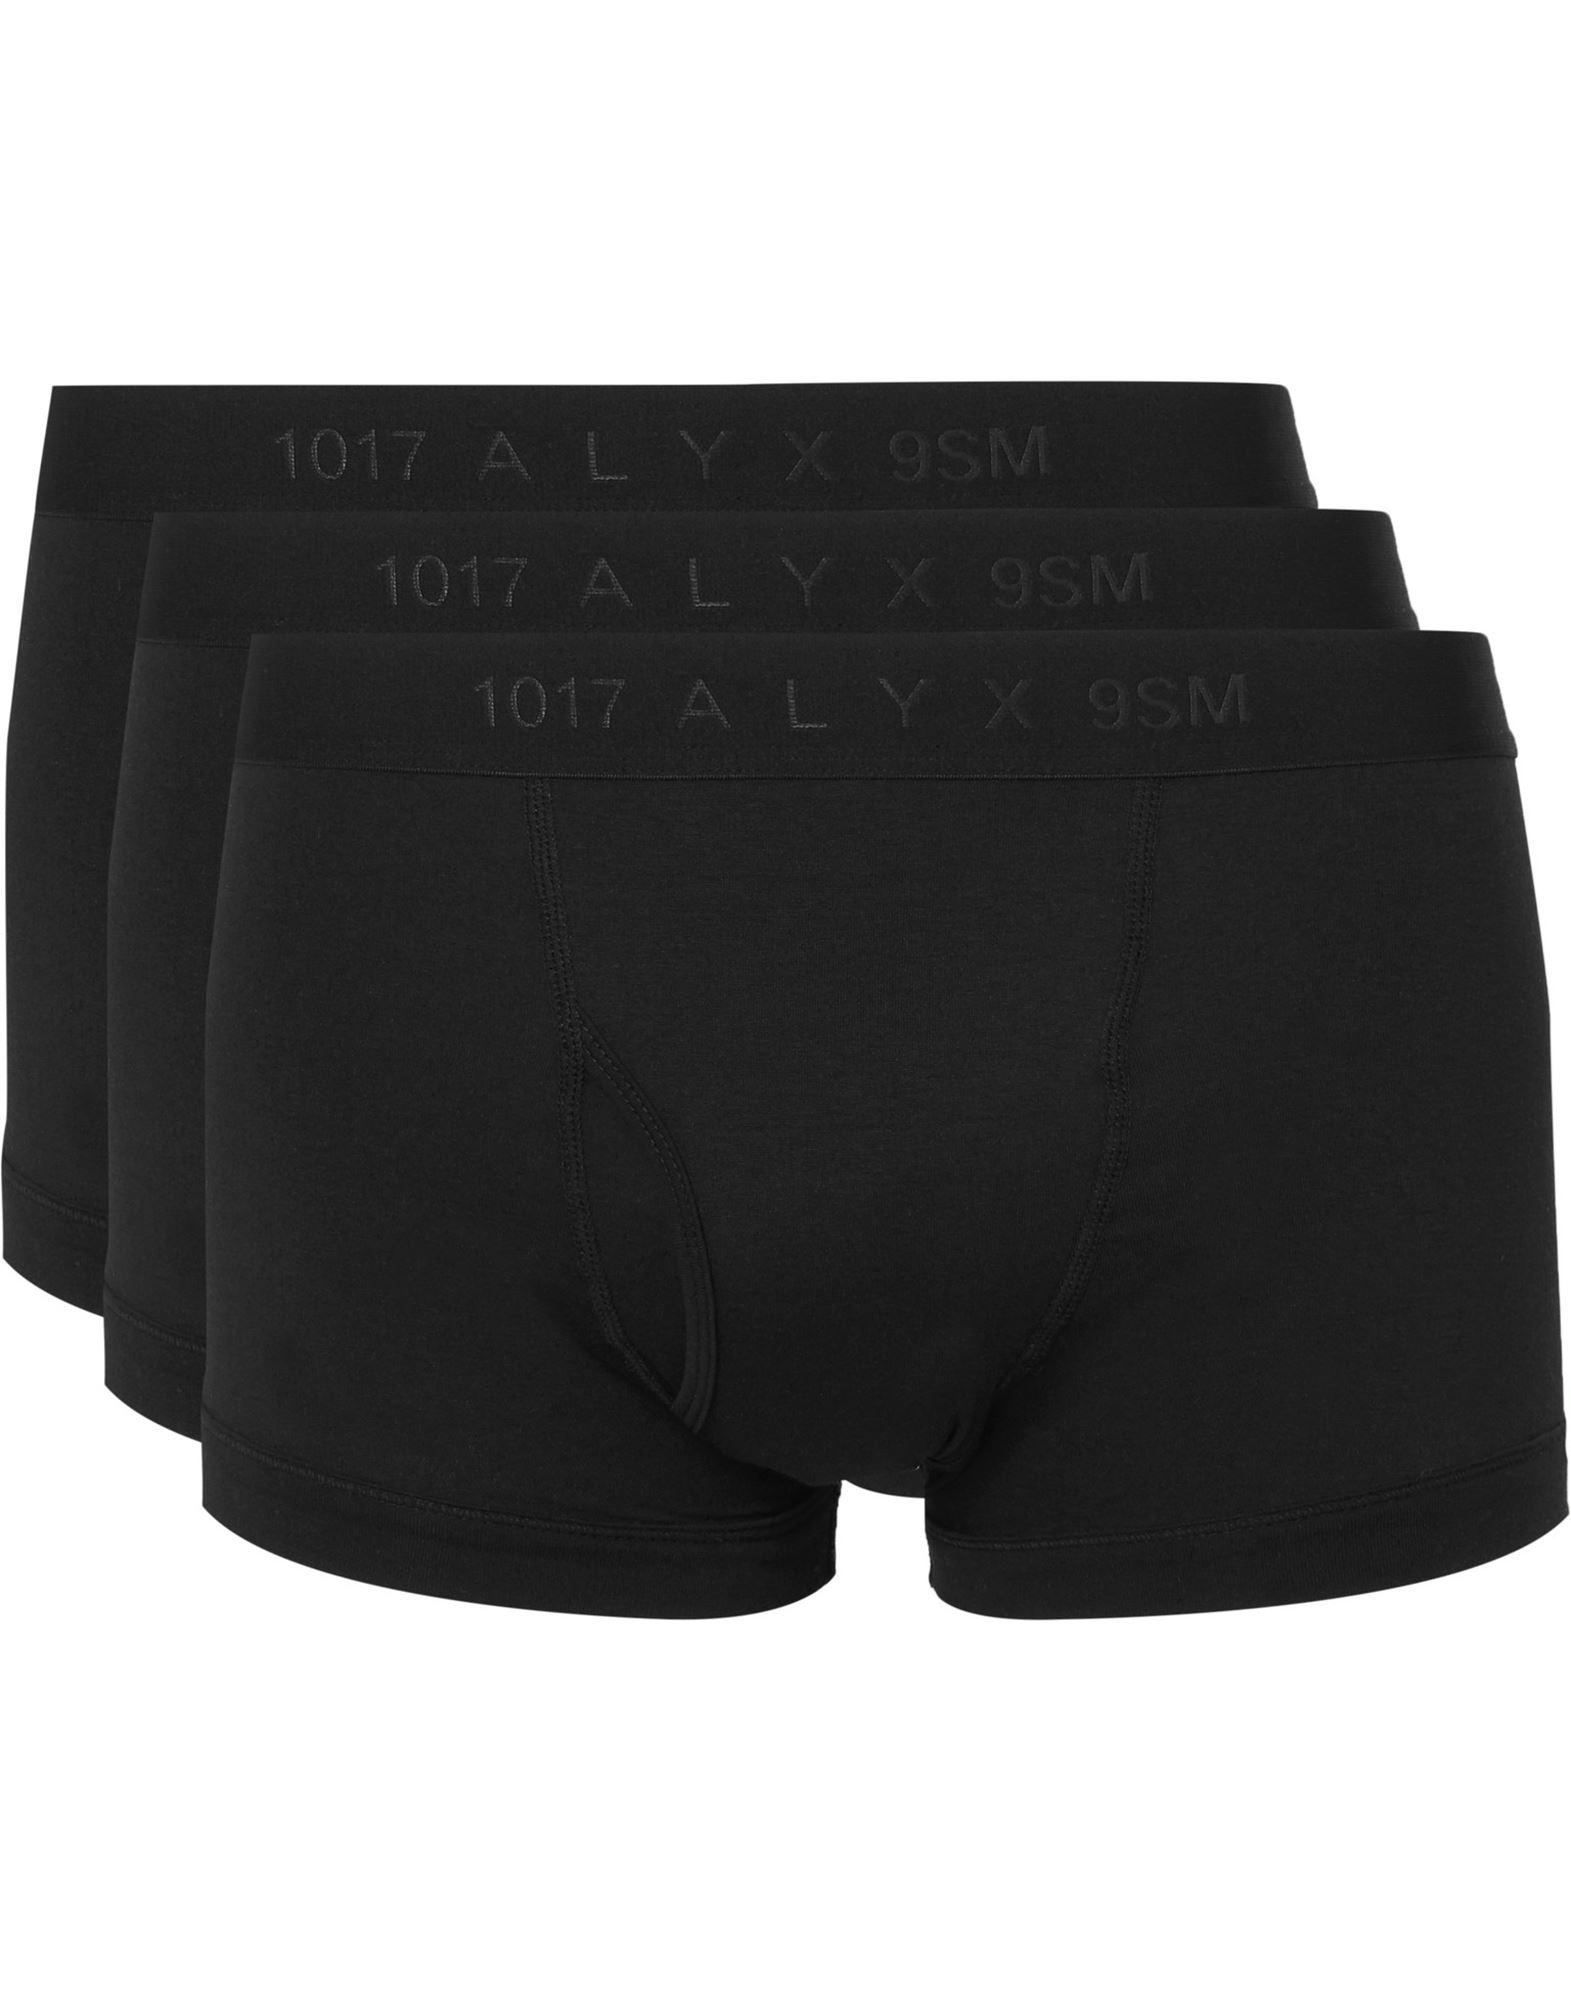 1017 ALYX 9SM Боксеры 1017 alyx 9sm сумка на руку